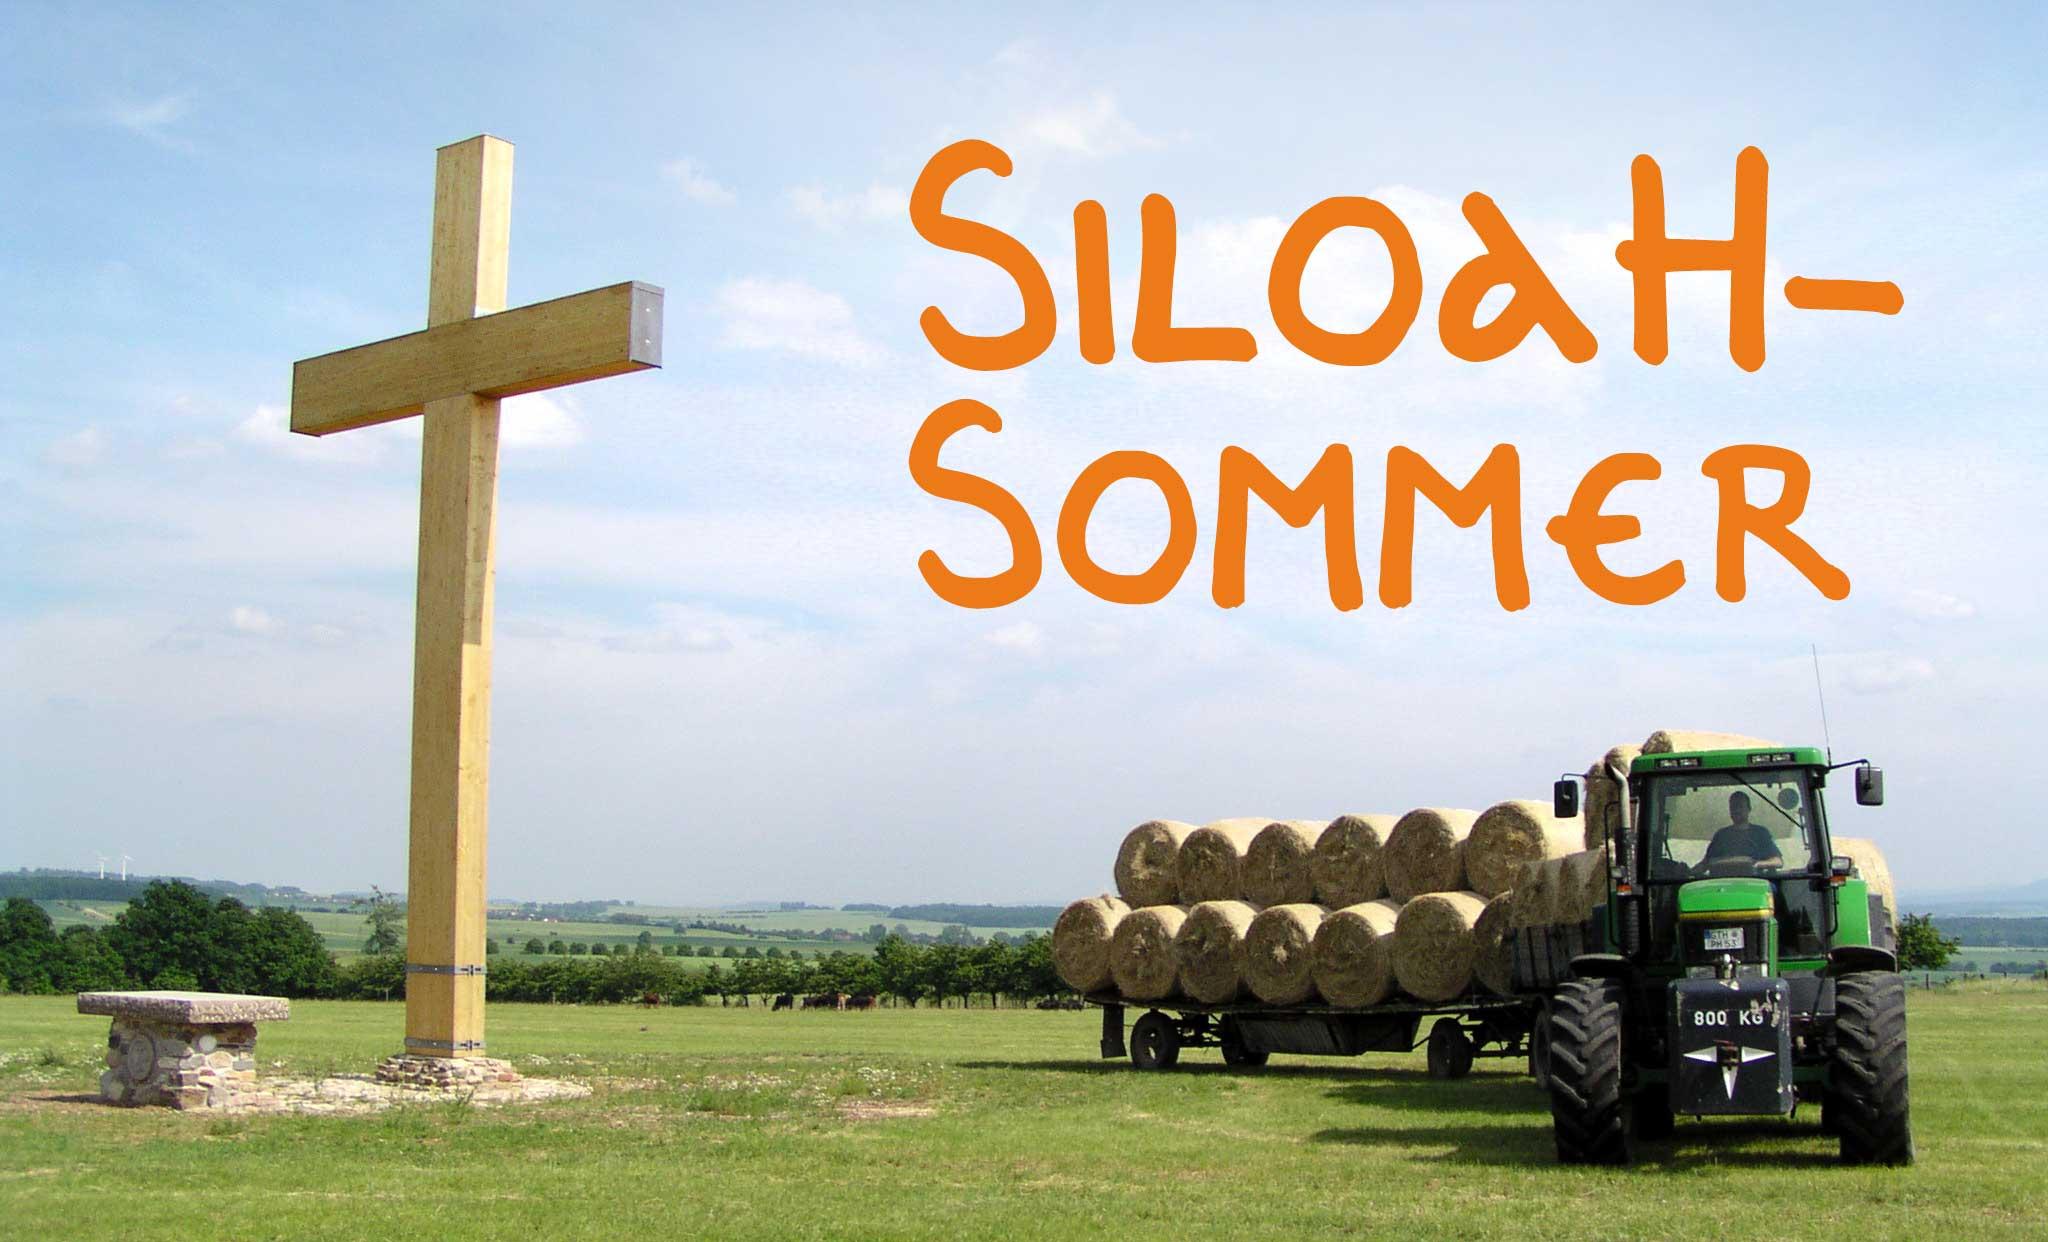 Foto_Familien_Sommer_Traktor_Kreuz_Schrift